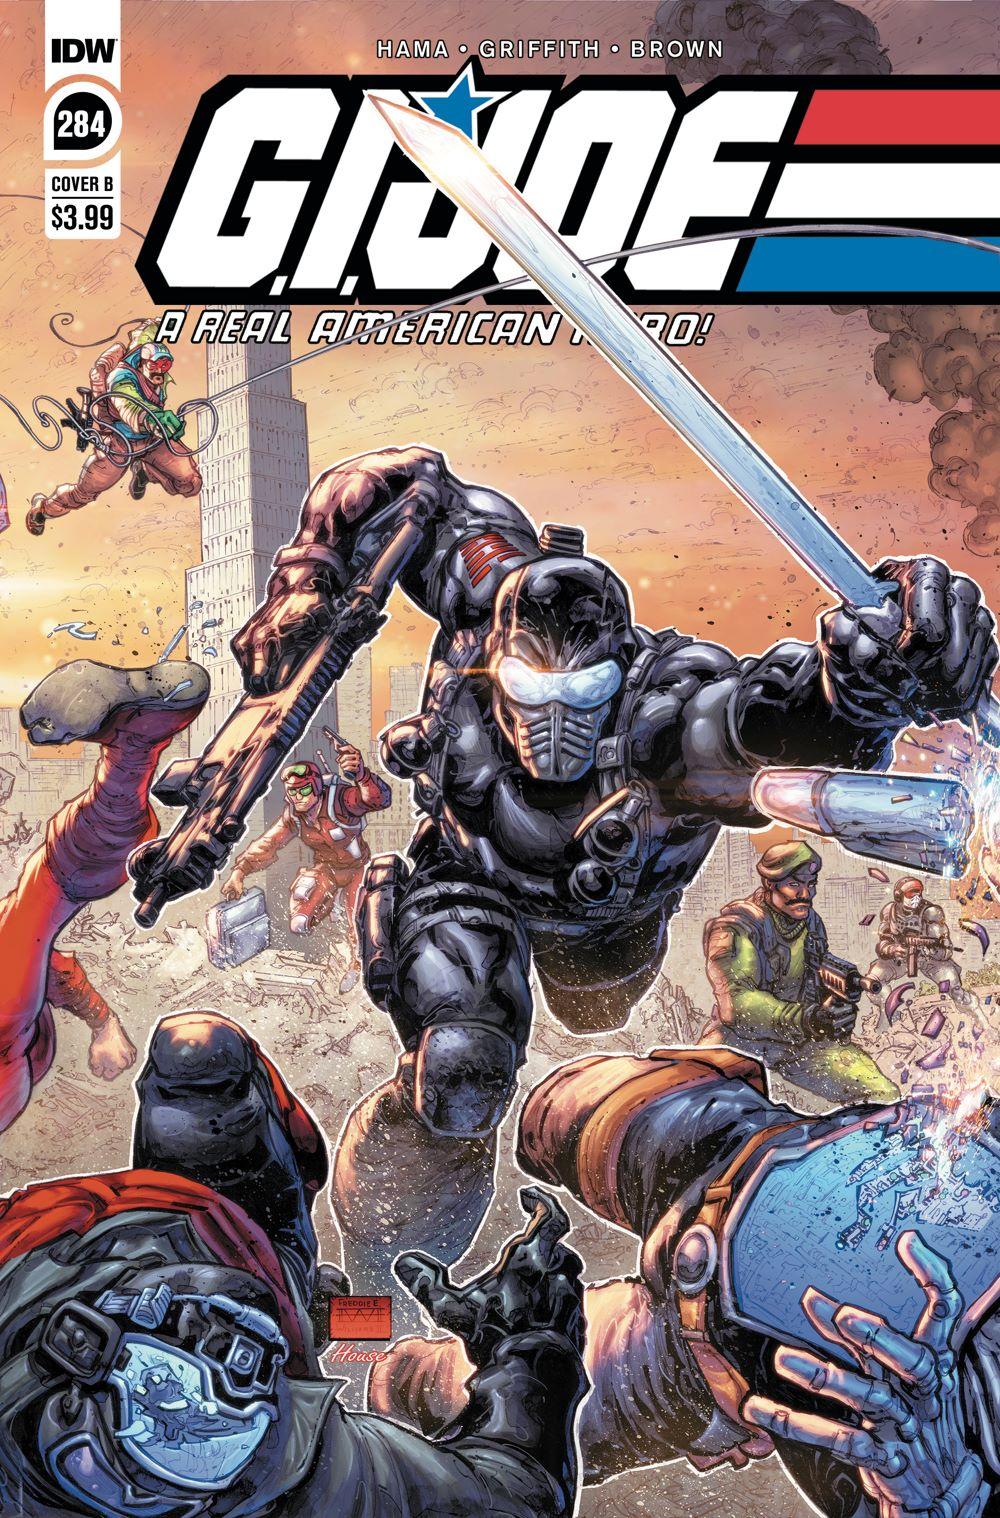 GIJoeRAH284-coverB ComicList Previews: G.I. JOE A REAL AMERICAN HERO #284